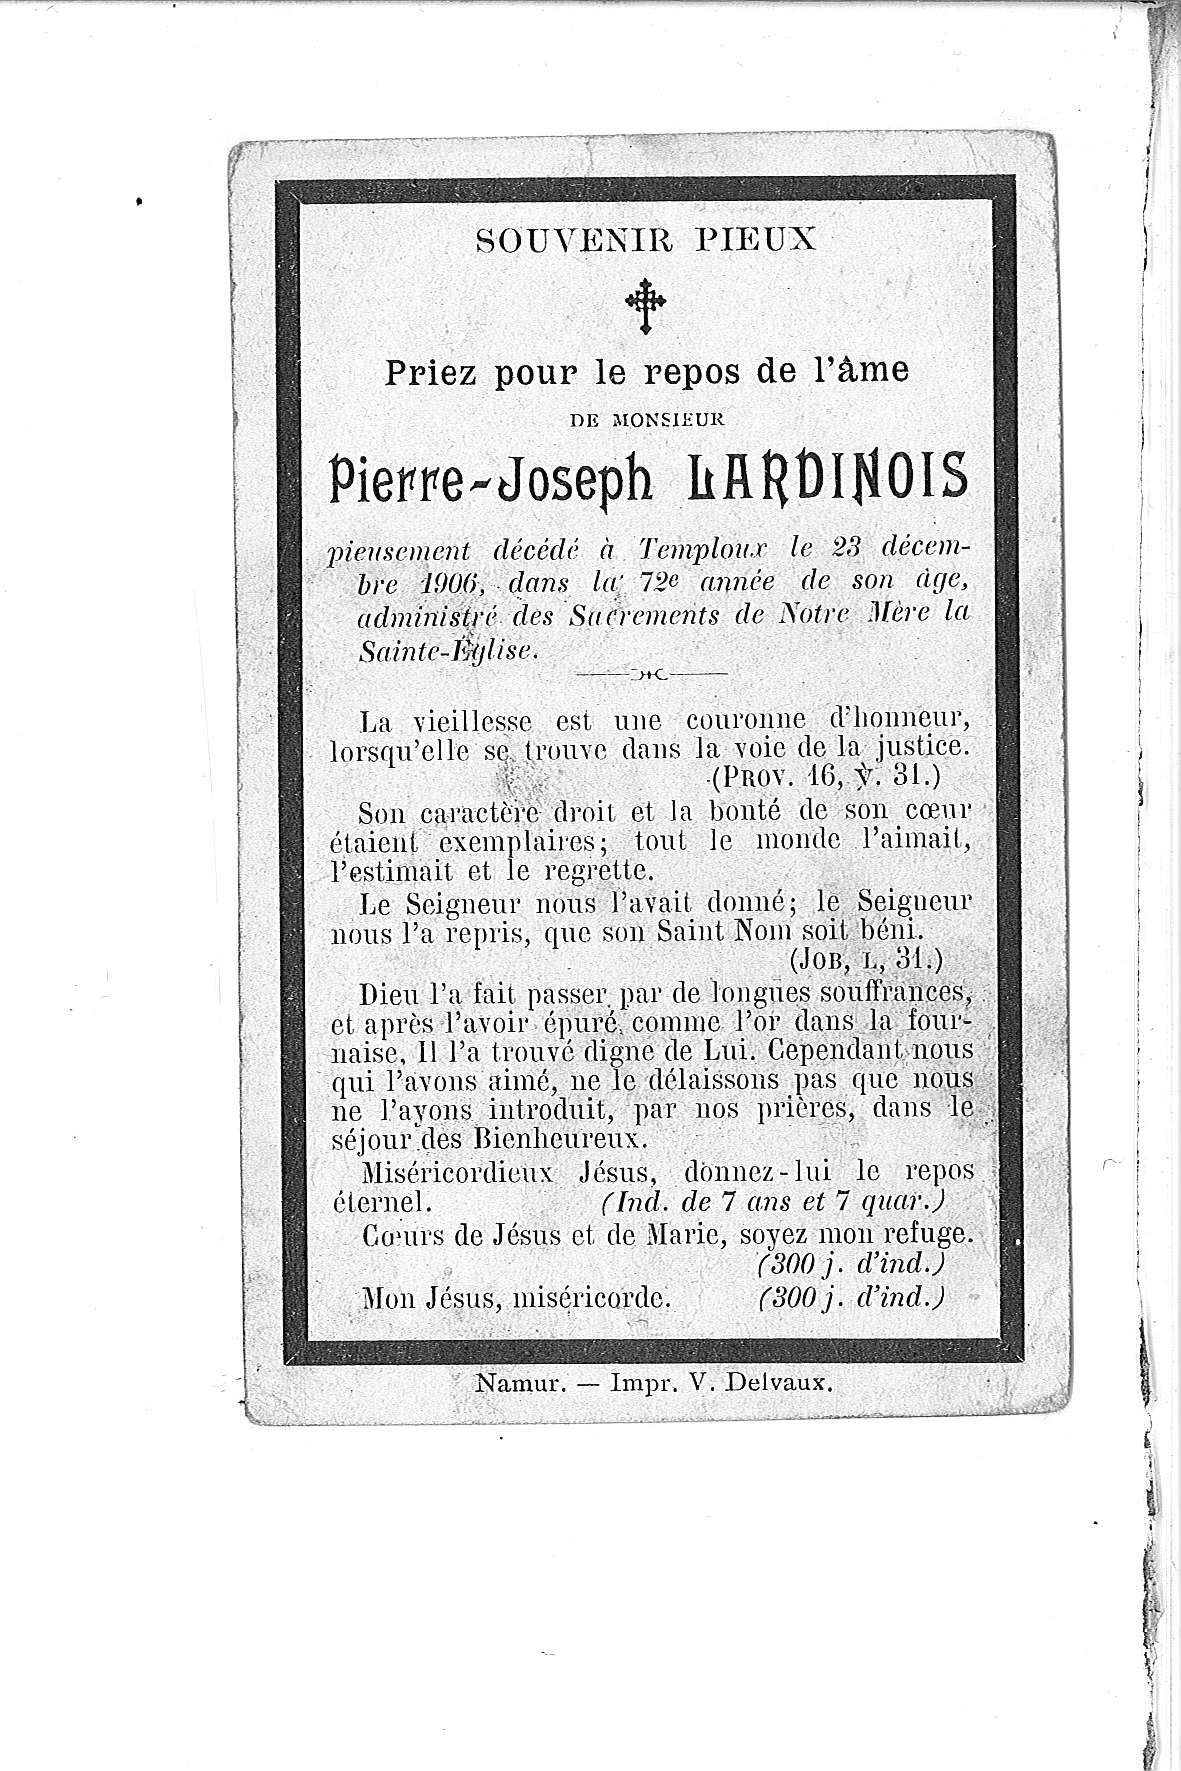 Pierre-Joseph20111004152800_00010.jpg